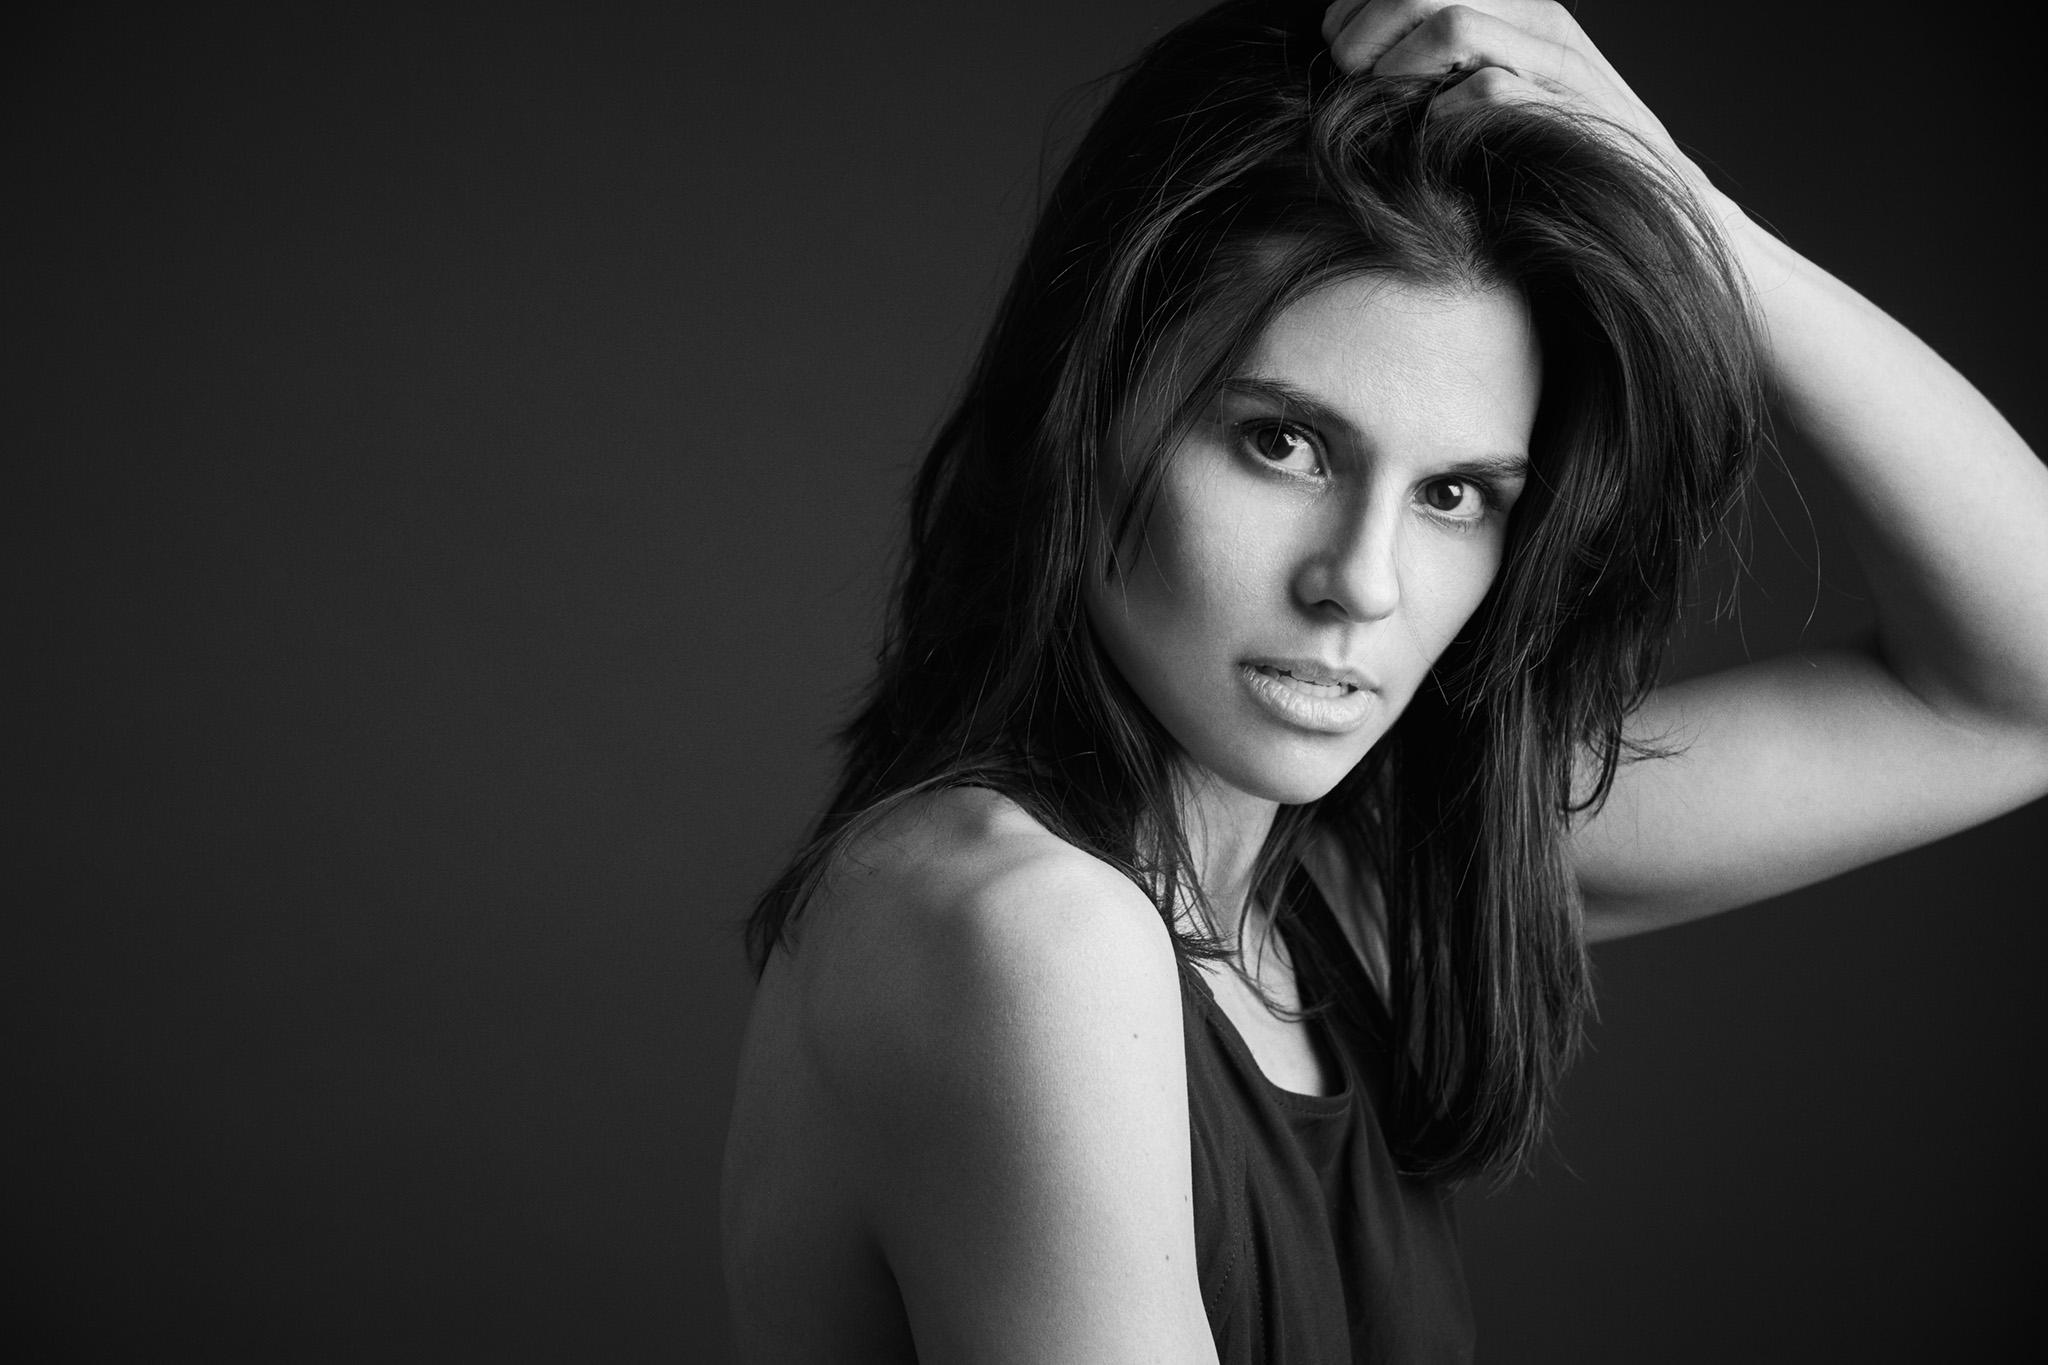 Nicole_Peelman_Portrait_Commercial_Model_Fashion_Shoot_Minneapolis_Photographer_Joe_Lemke_003.JPG